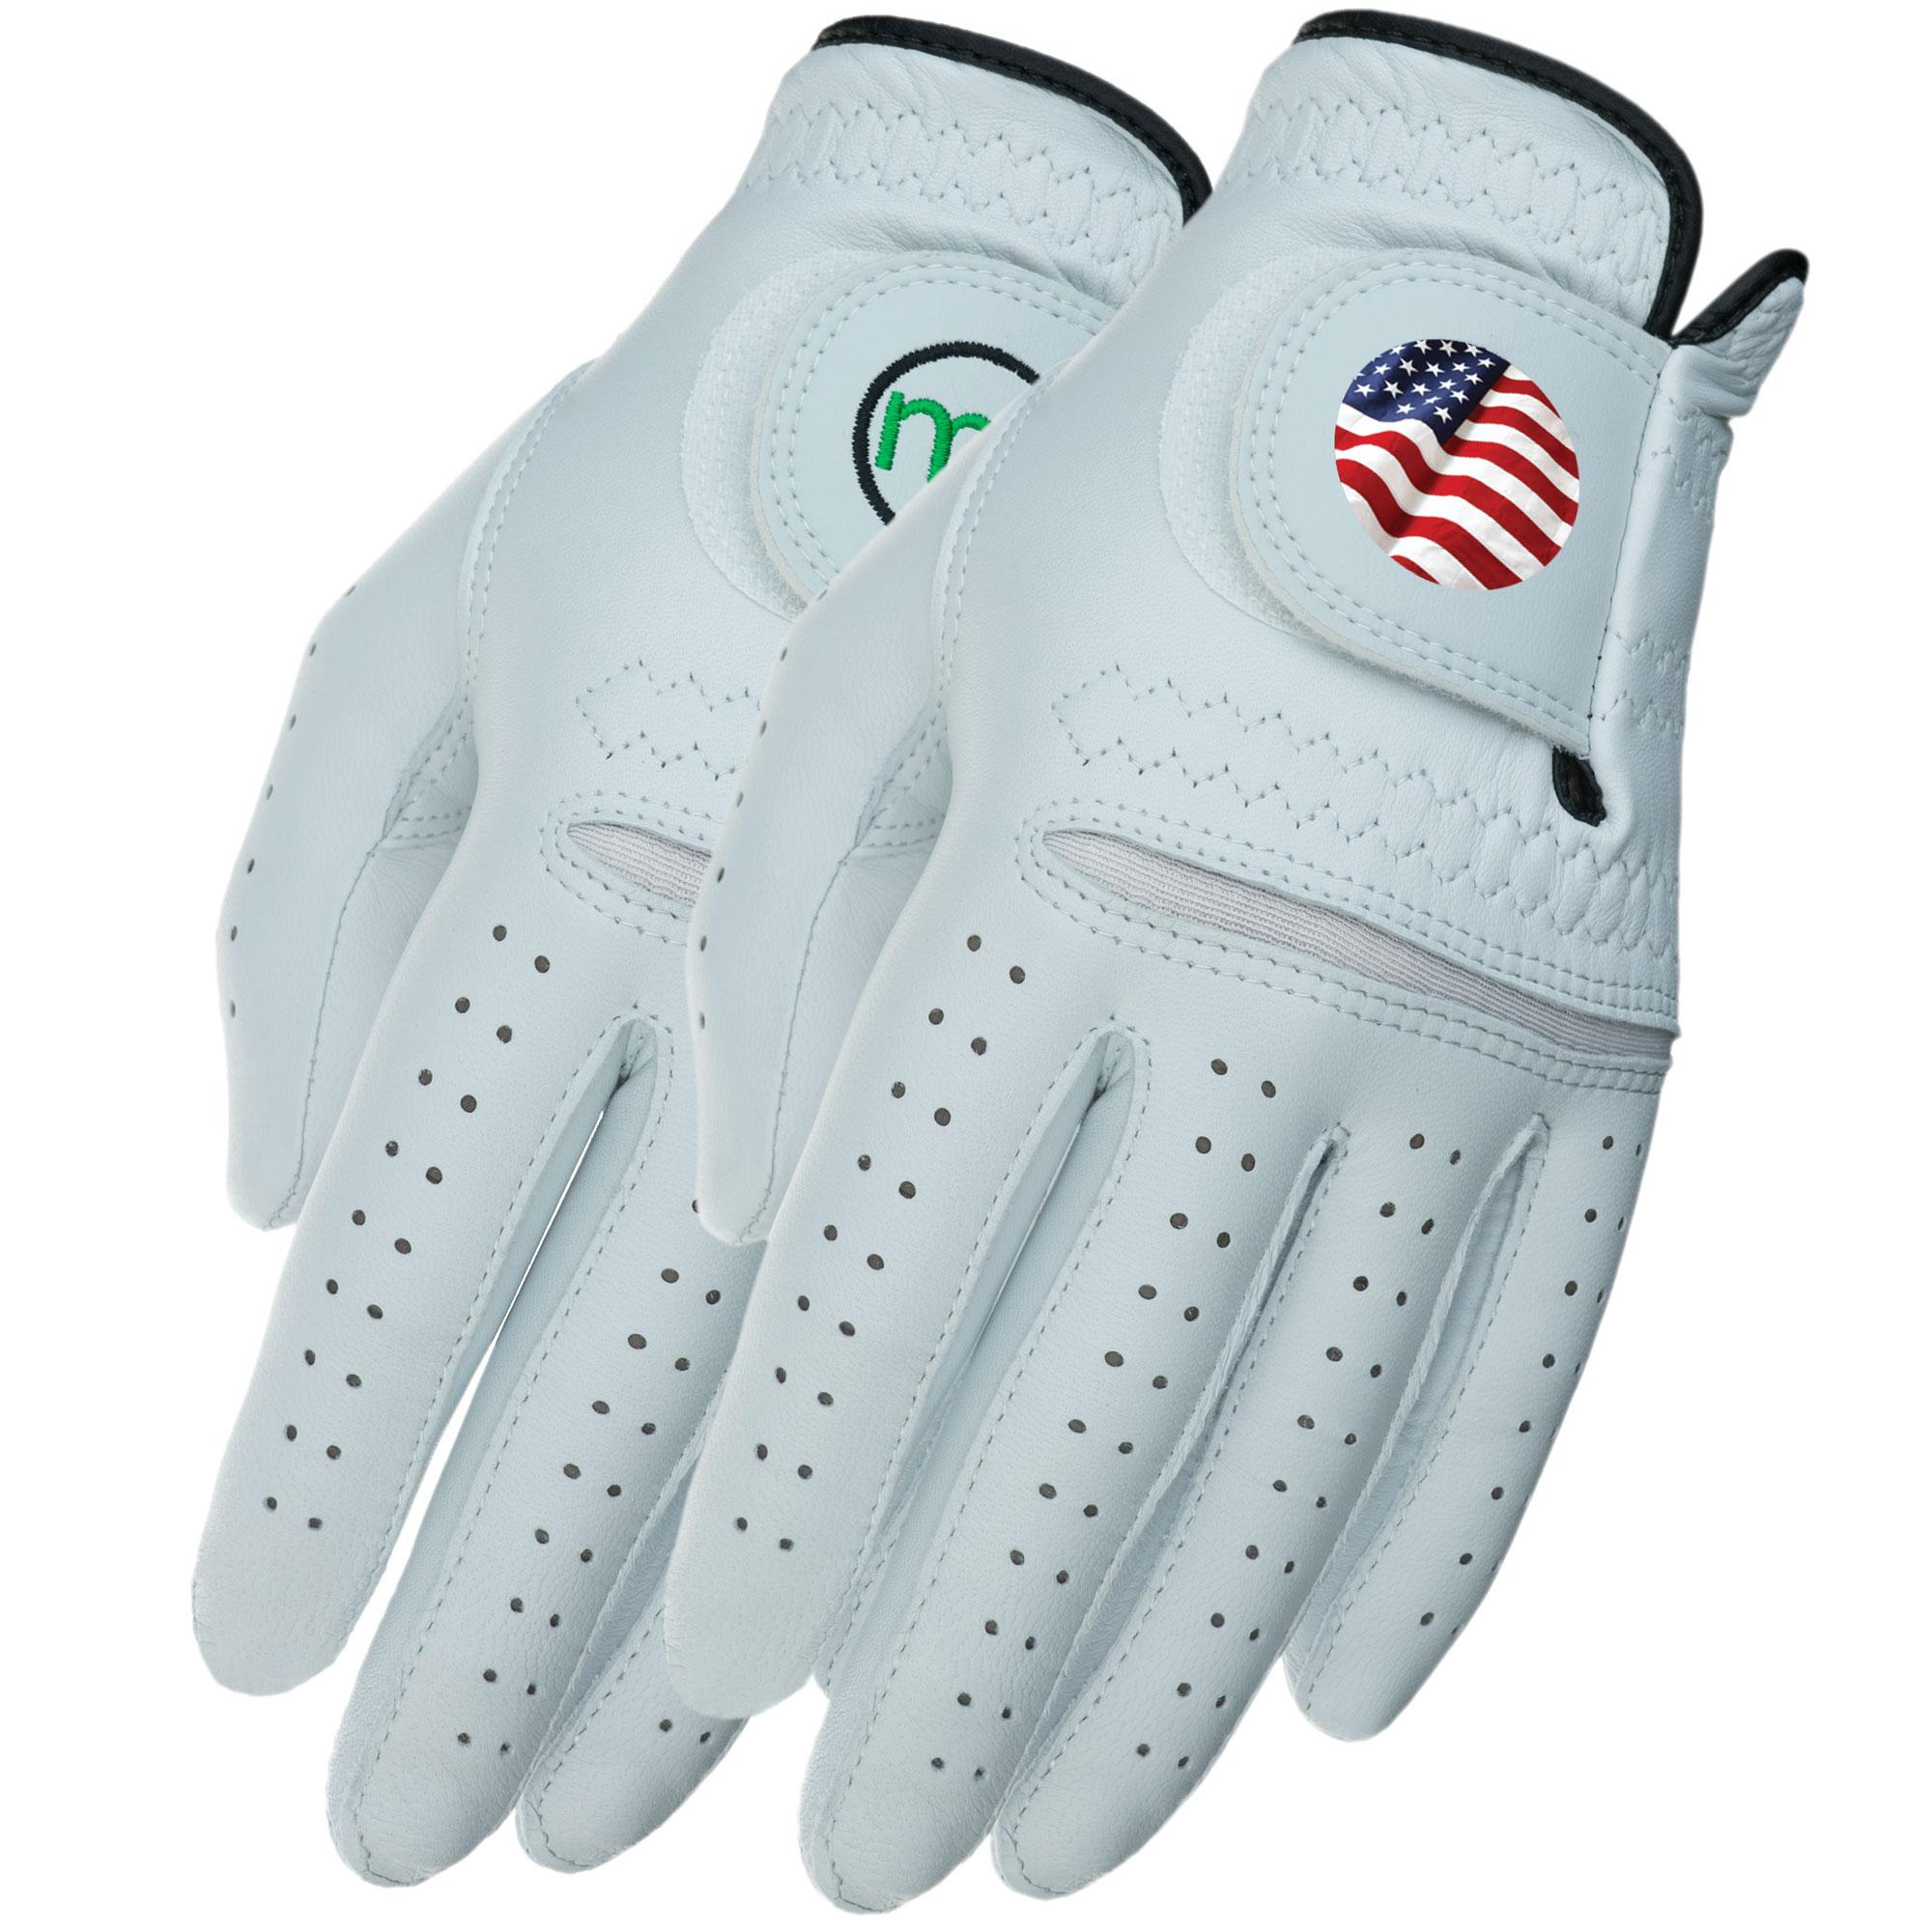 Short Gloves White in Display Pack